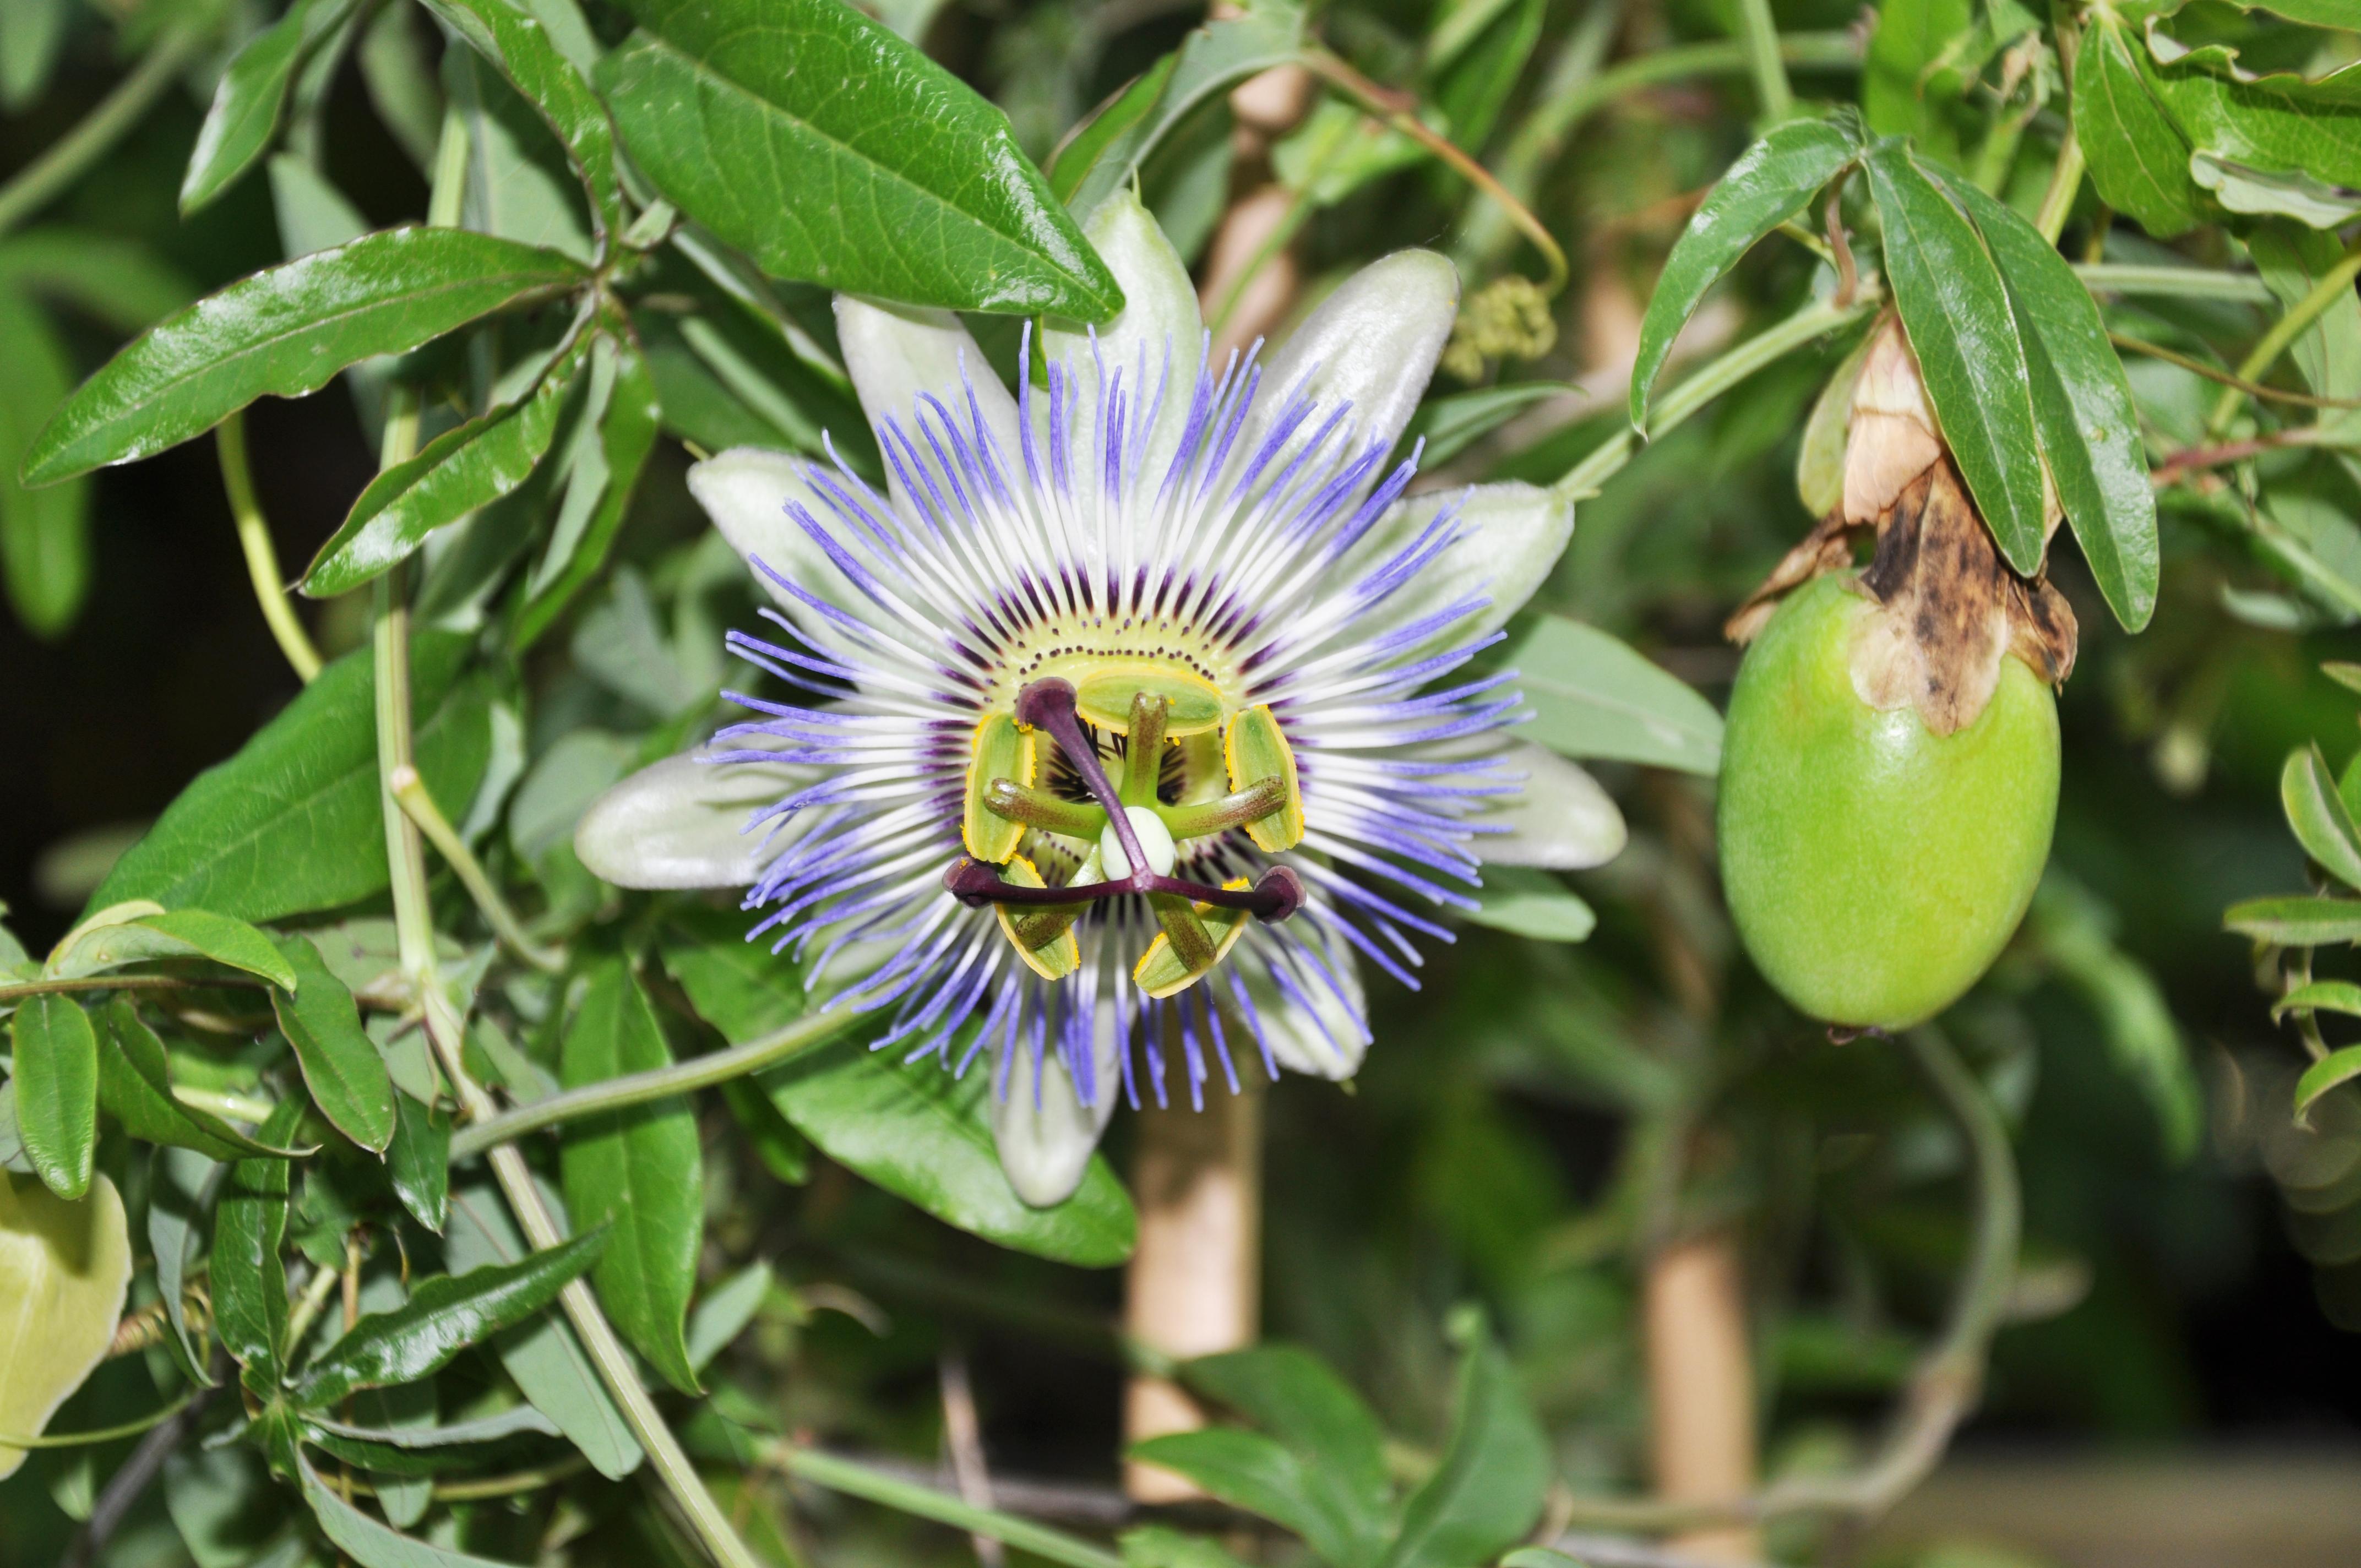 Filepassiflora Caerulea Blue Passion Flower